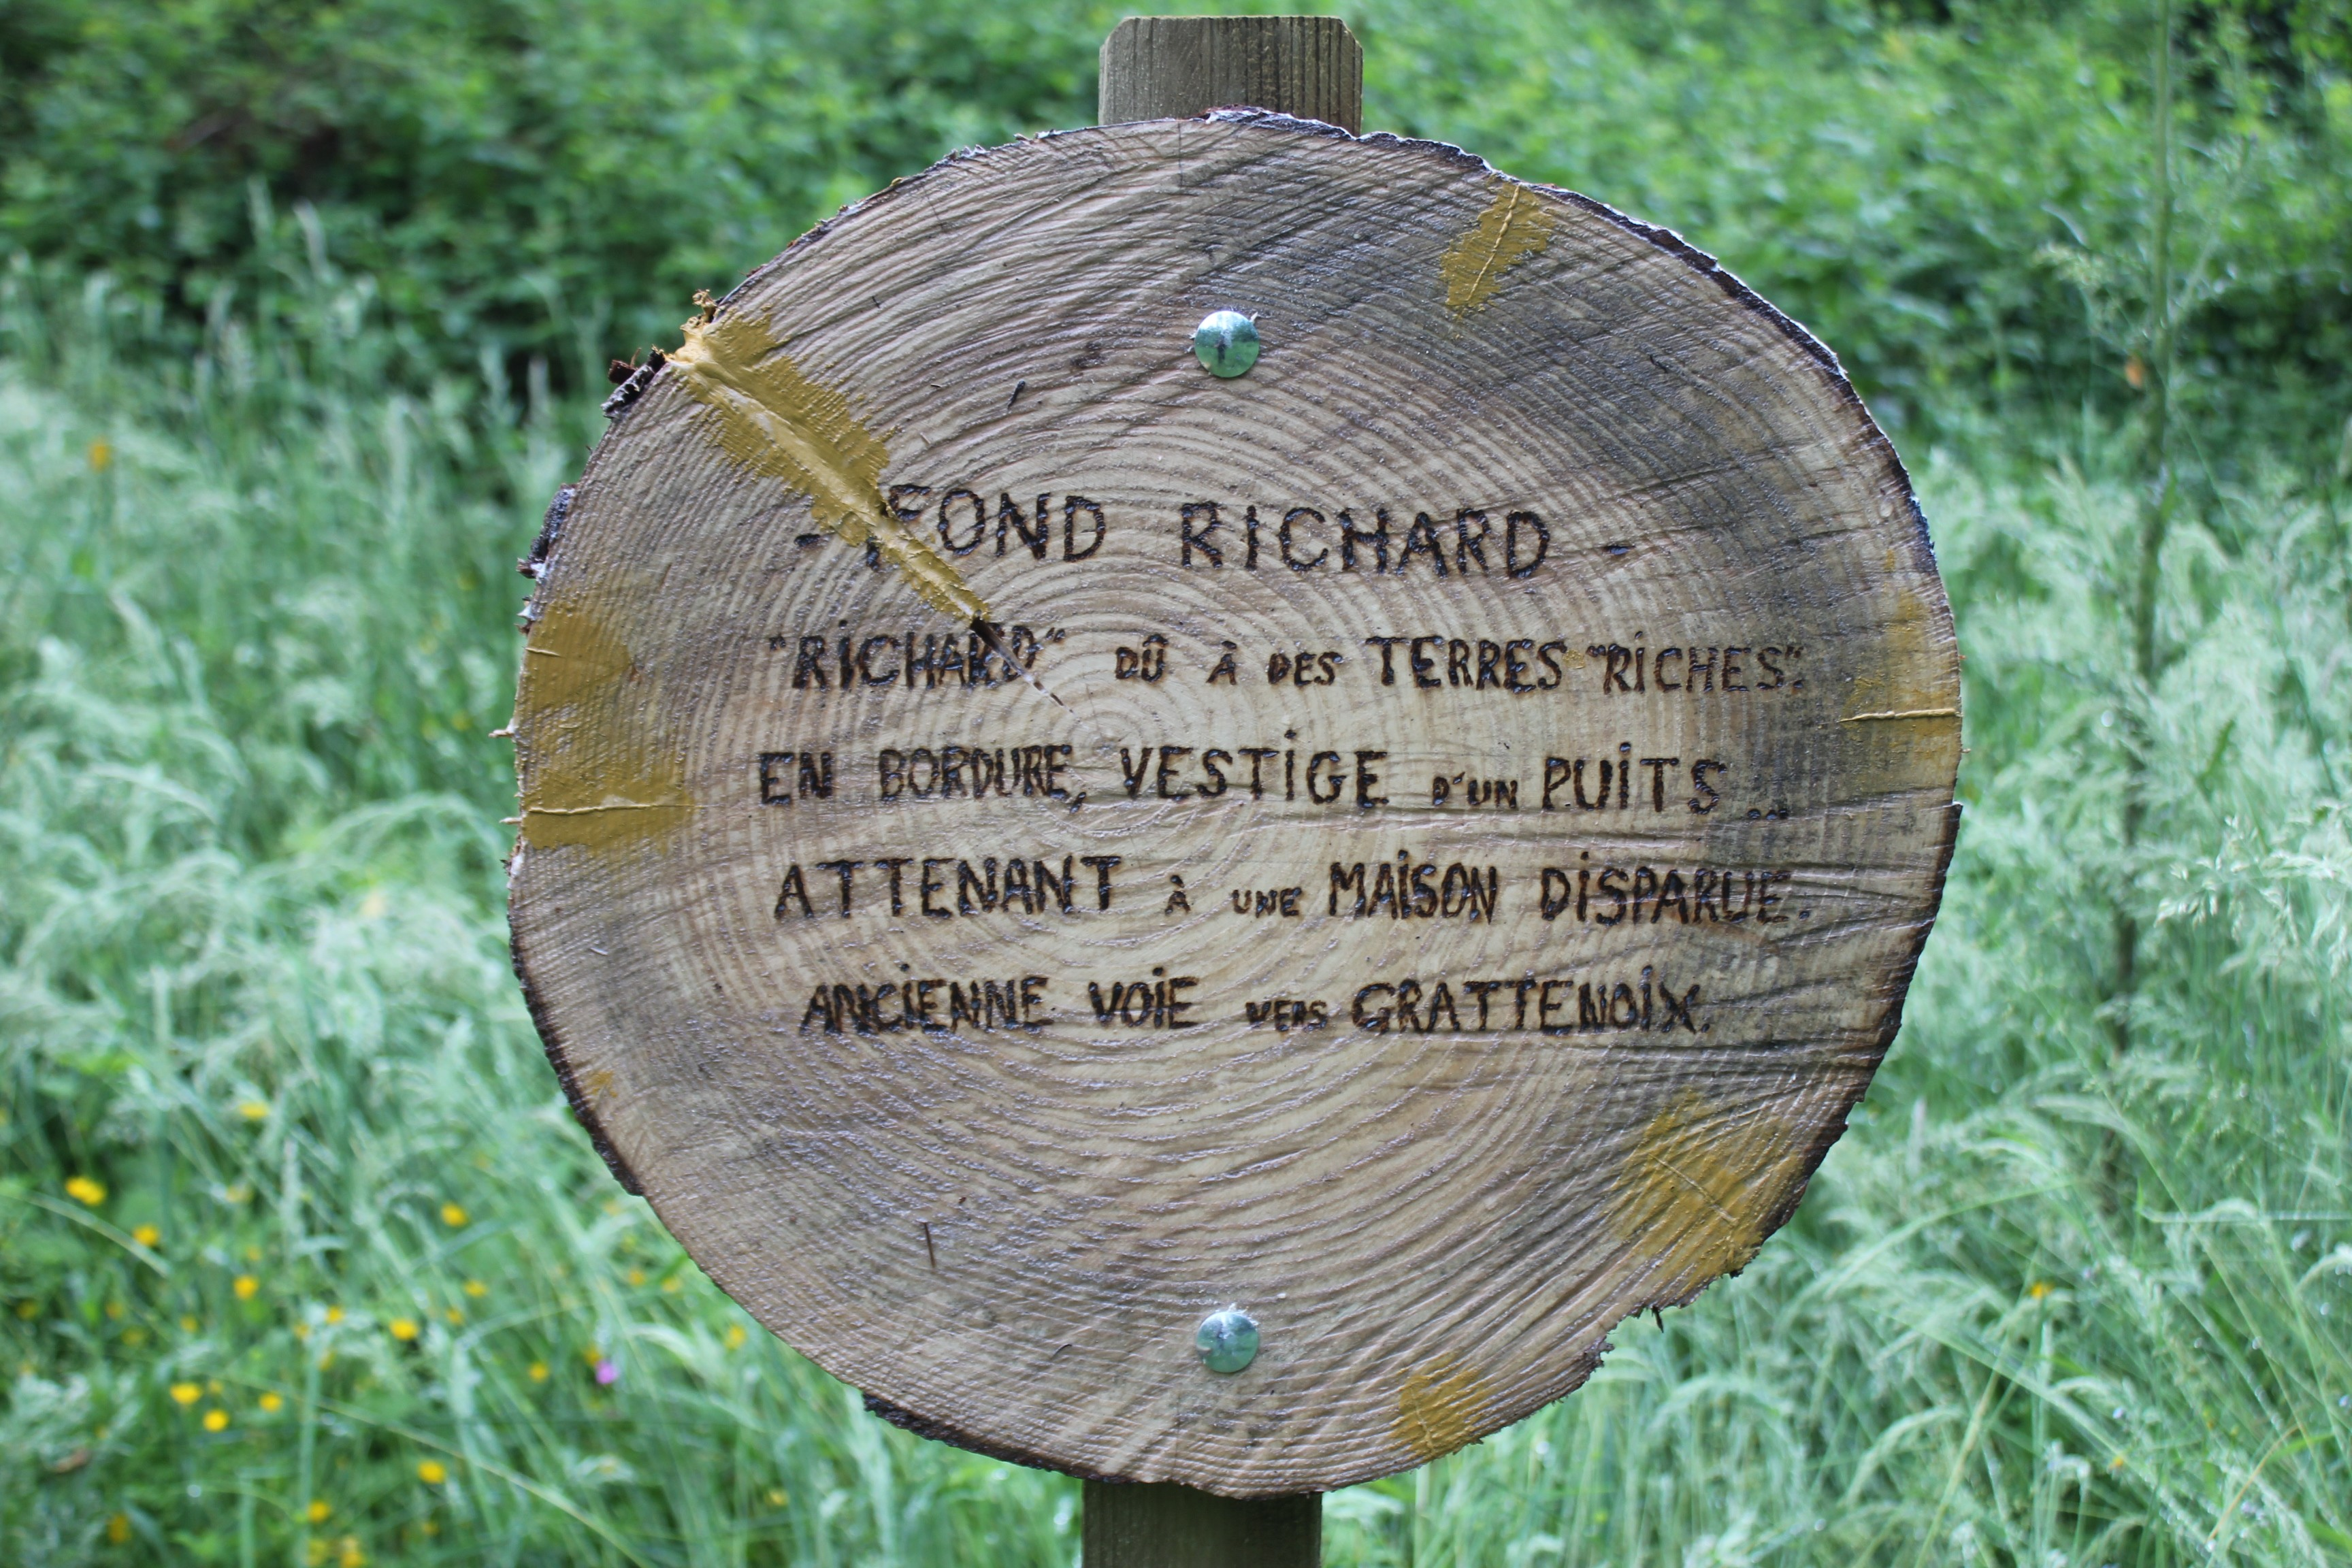 Fond Richard